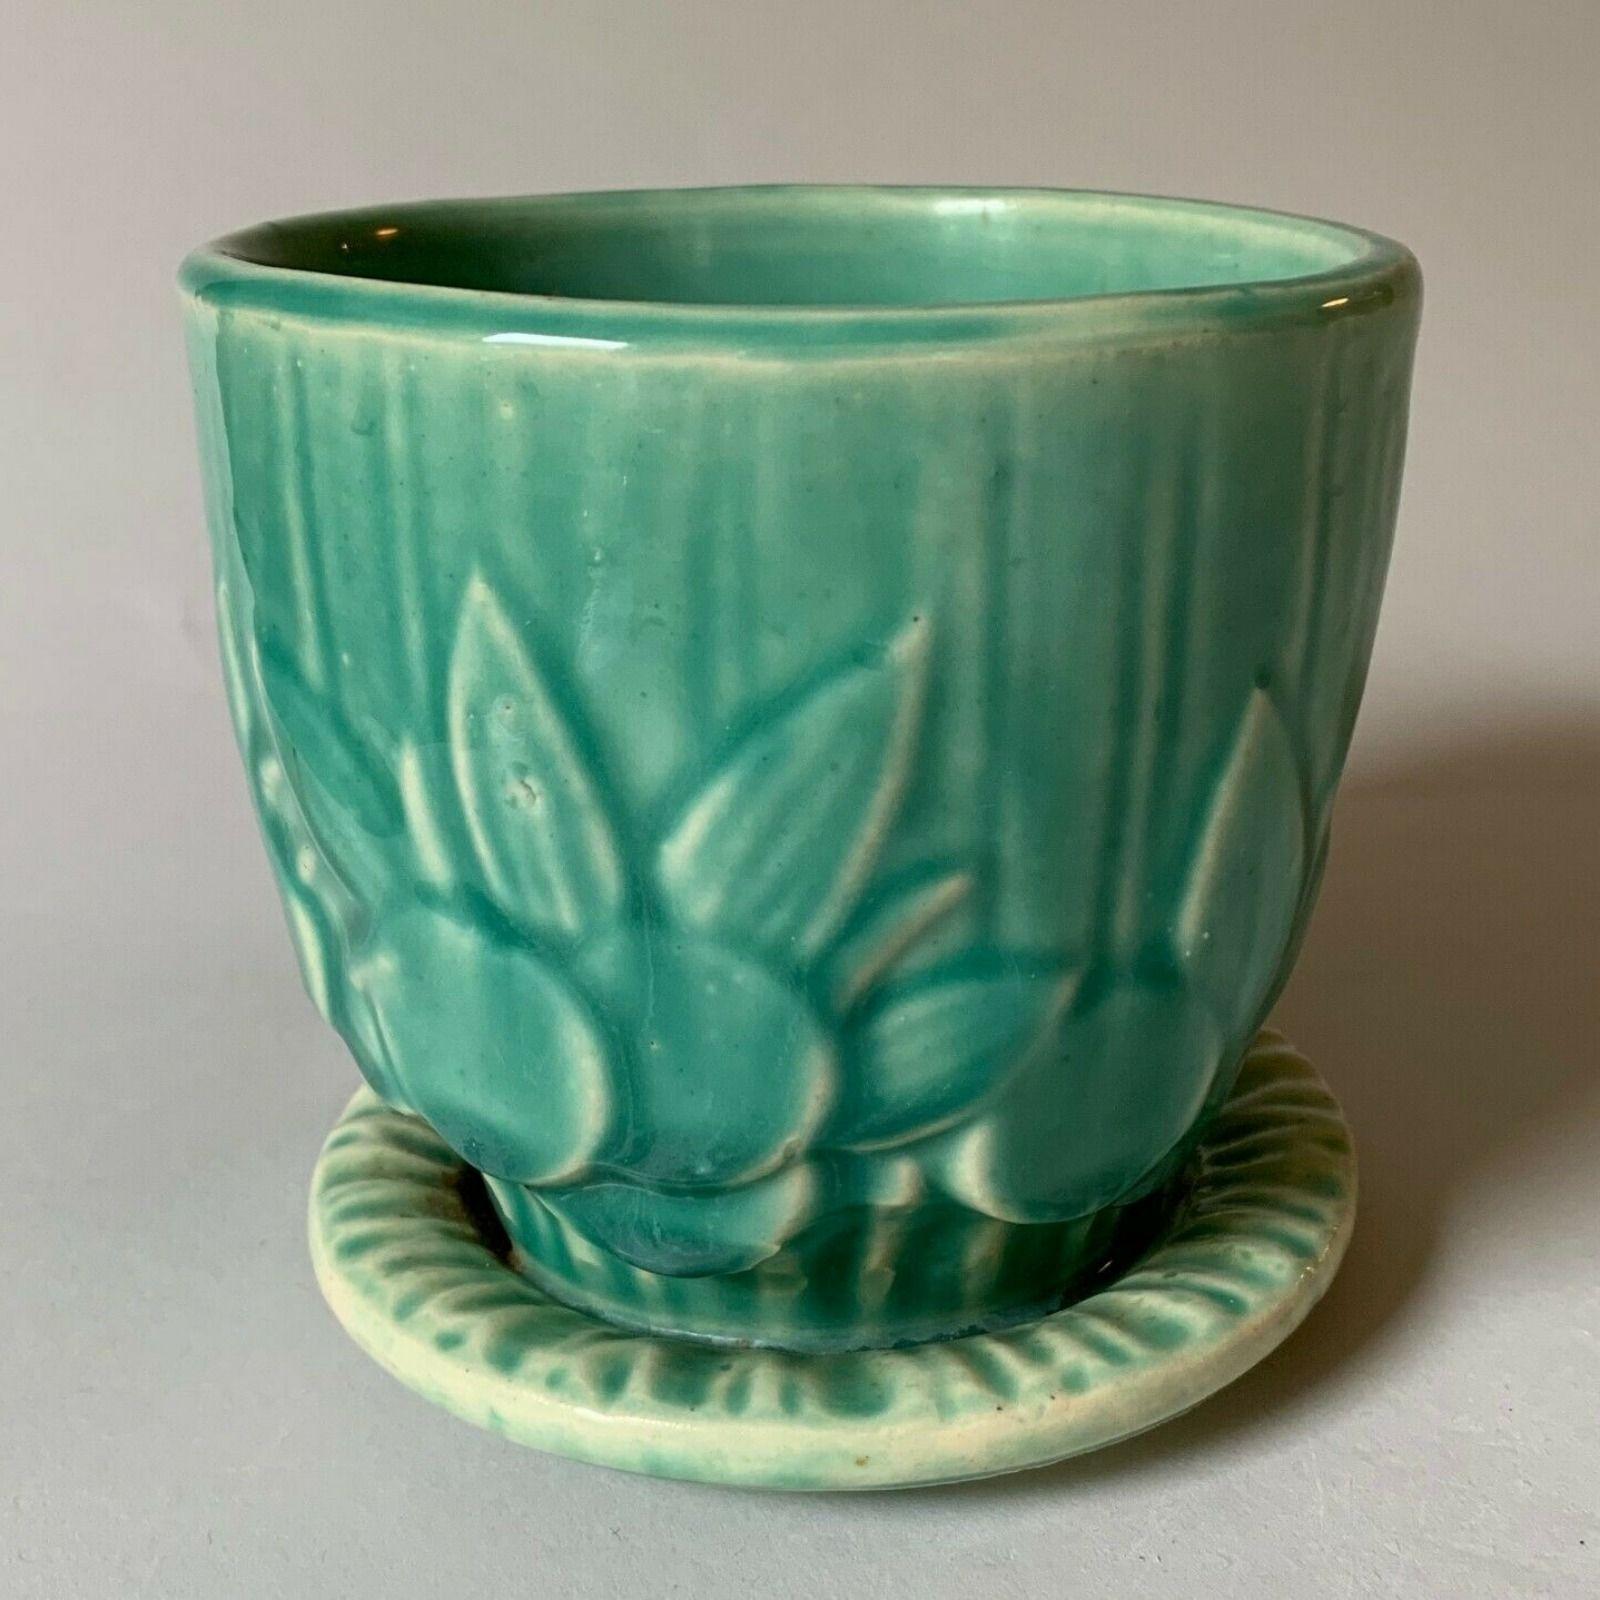 1940 S Vintage Mccoy 4 Sand Dollar Pattern Flower Pot W Saucer In Gloss Green Flower Pots Flower Patterns Sand Dollar